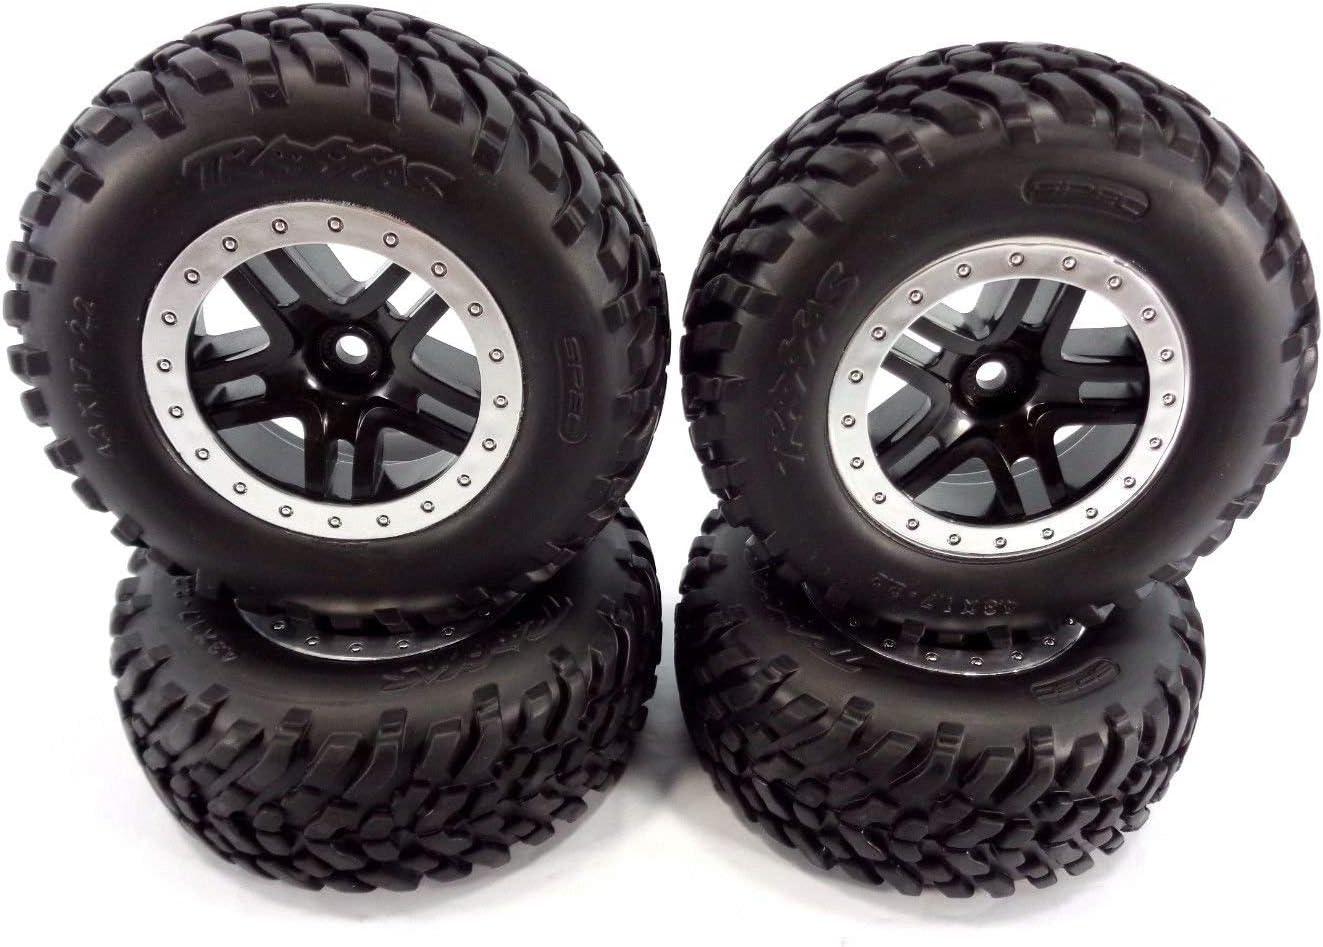 Slash 58034-2 2wd Tires Complete Free Shipping 12mm Black Rap Fit Spoke Wheels Split Latest item